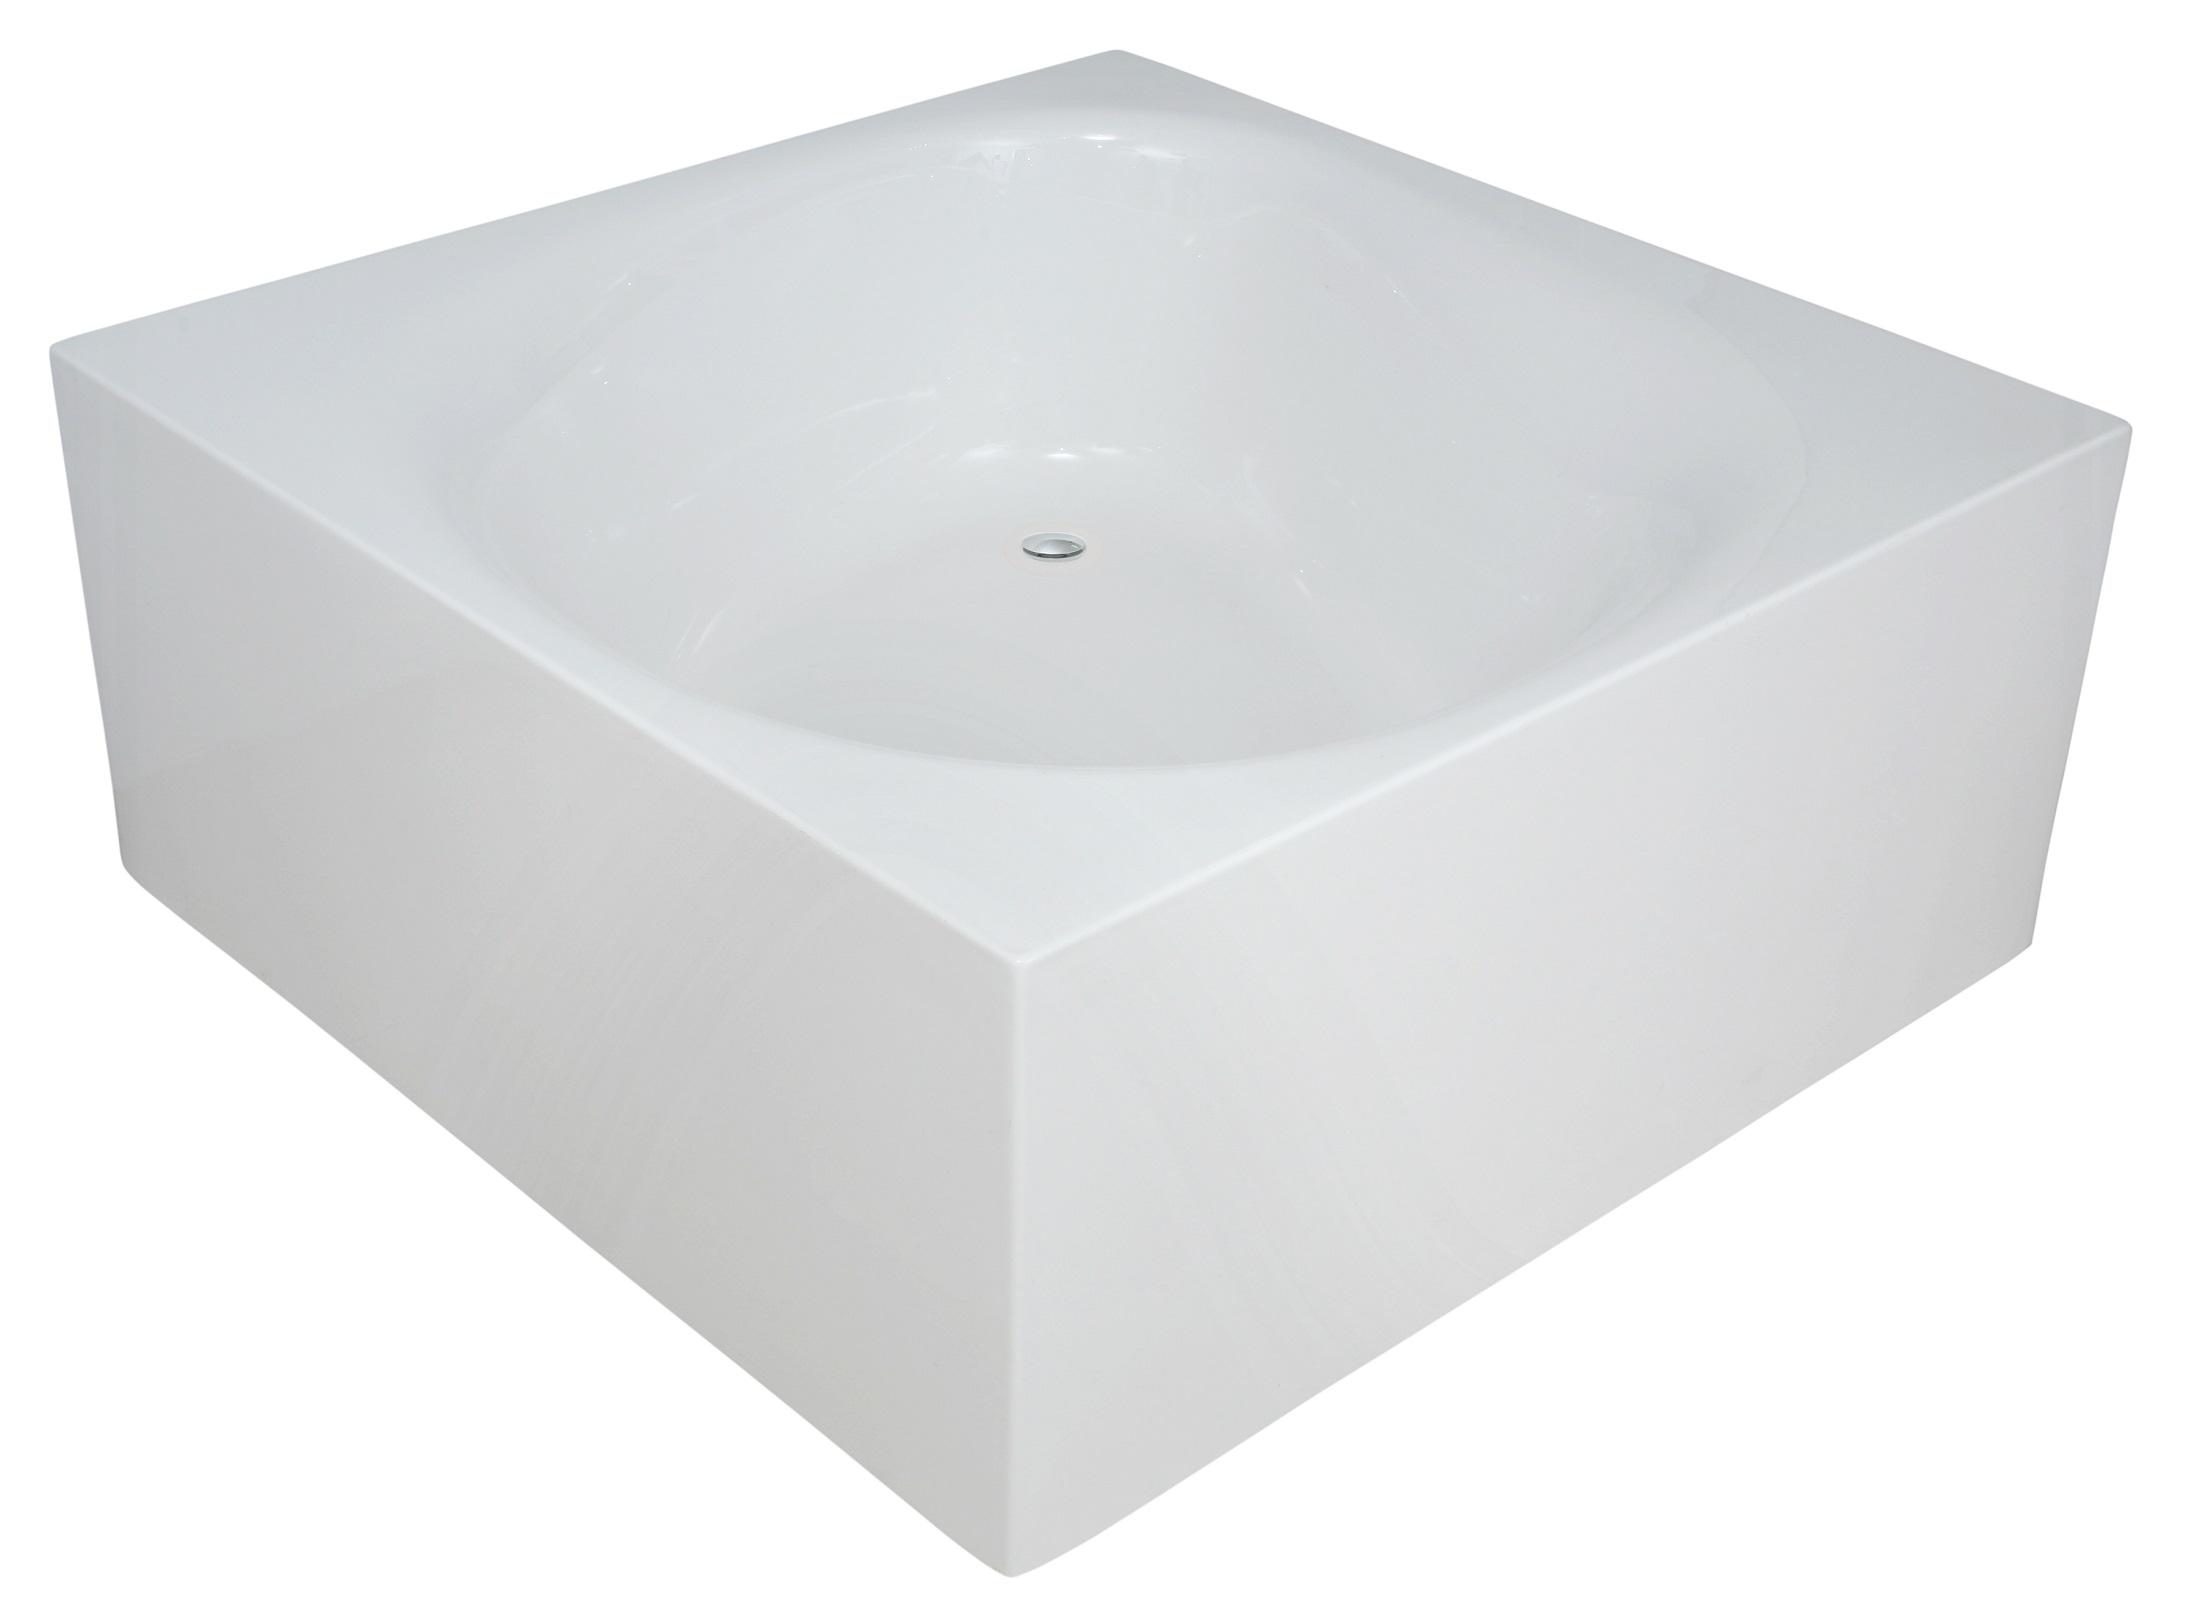 Emejing Vasche Da Bagno Quadrate Images - Idee Arredamento Casa ...